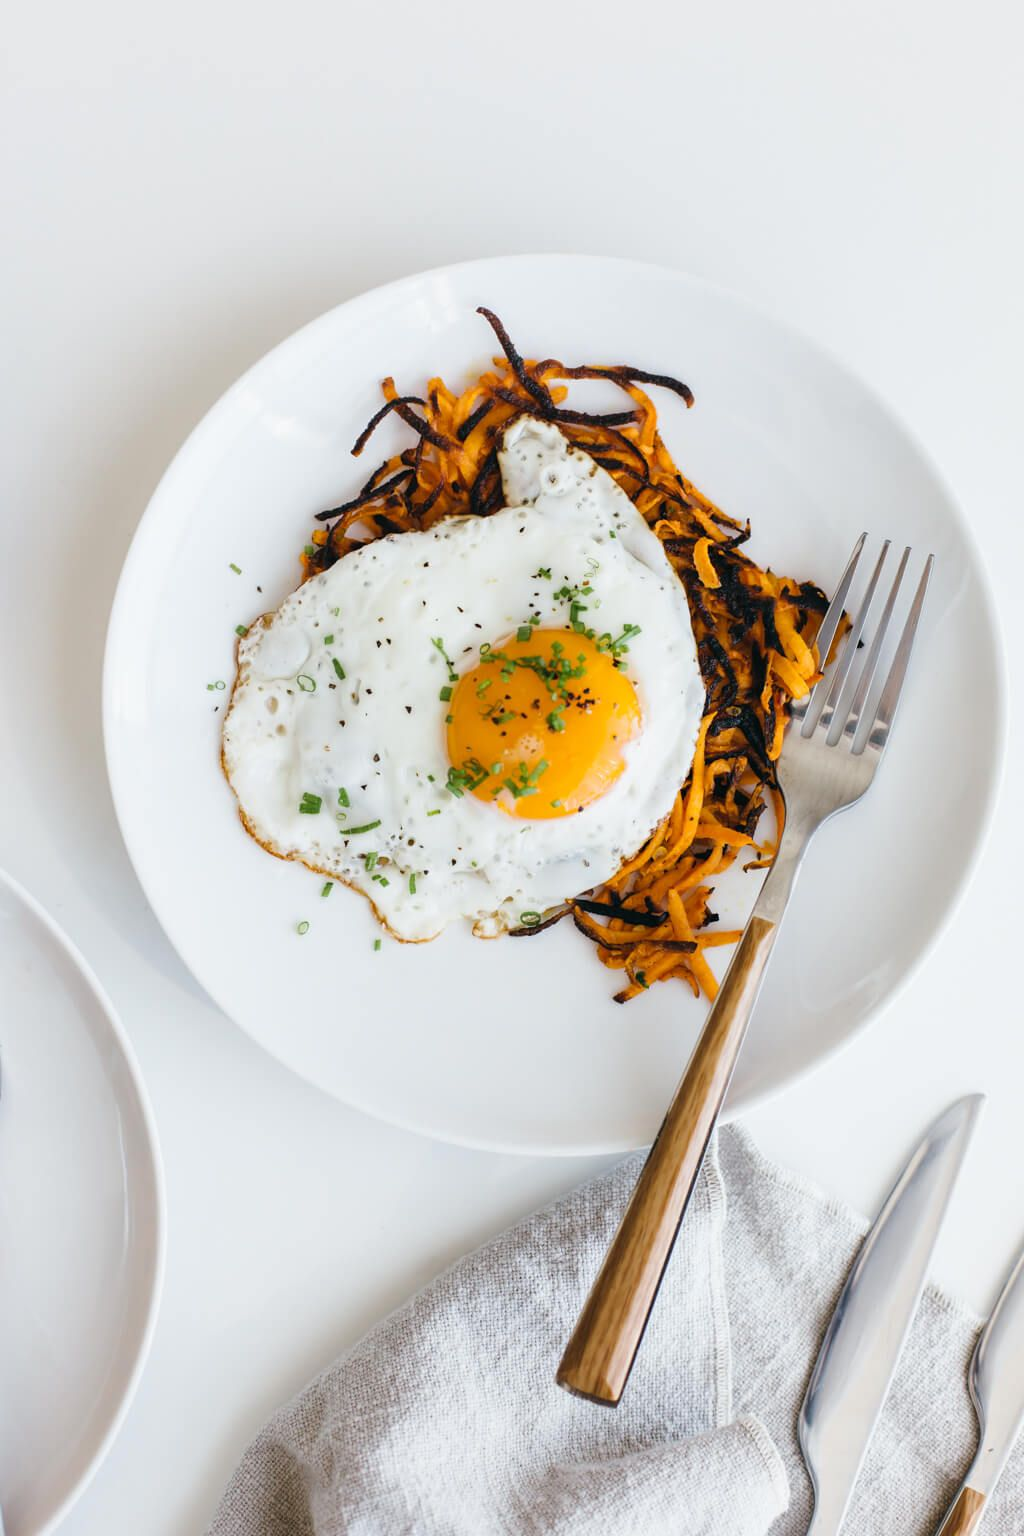 (glutenfree, vegan, paleo) These sweet potato hash browns